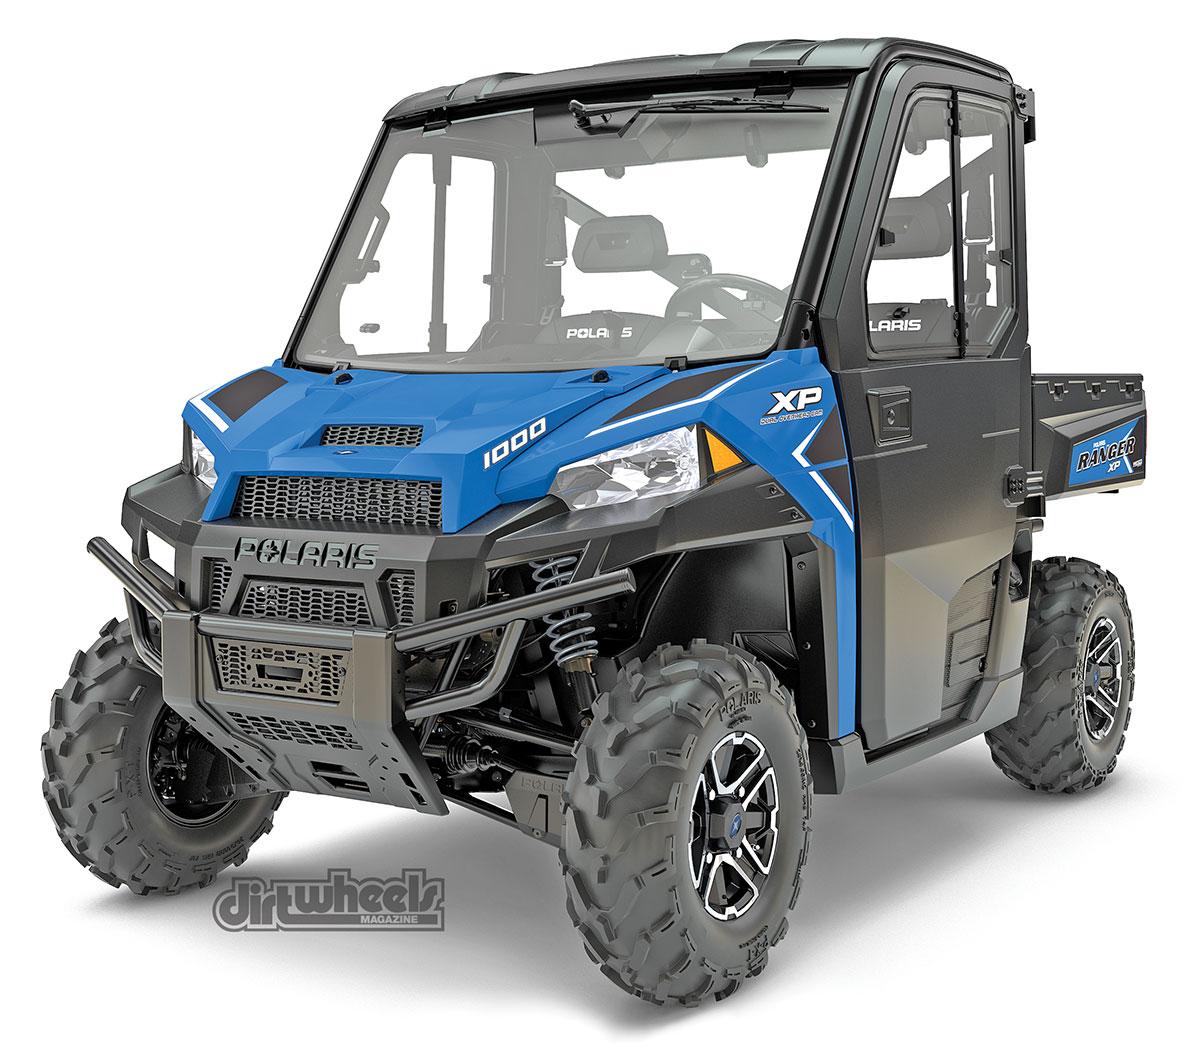 82_2017-ranger-xp-1000-eps-northstar-hvac-edition-velocity-blue_3q